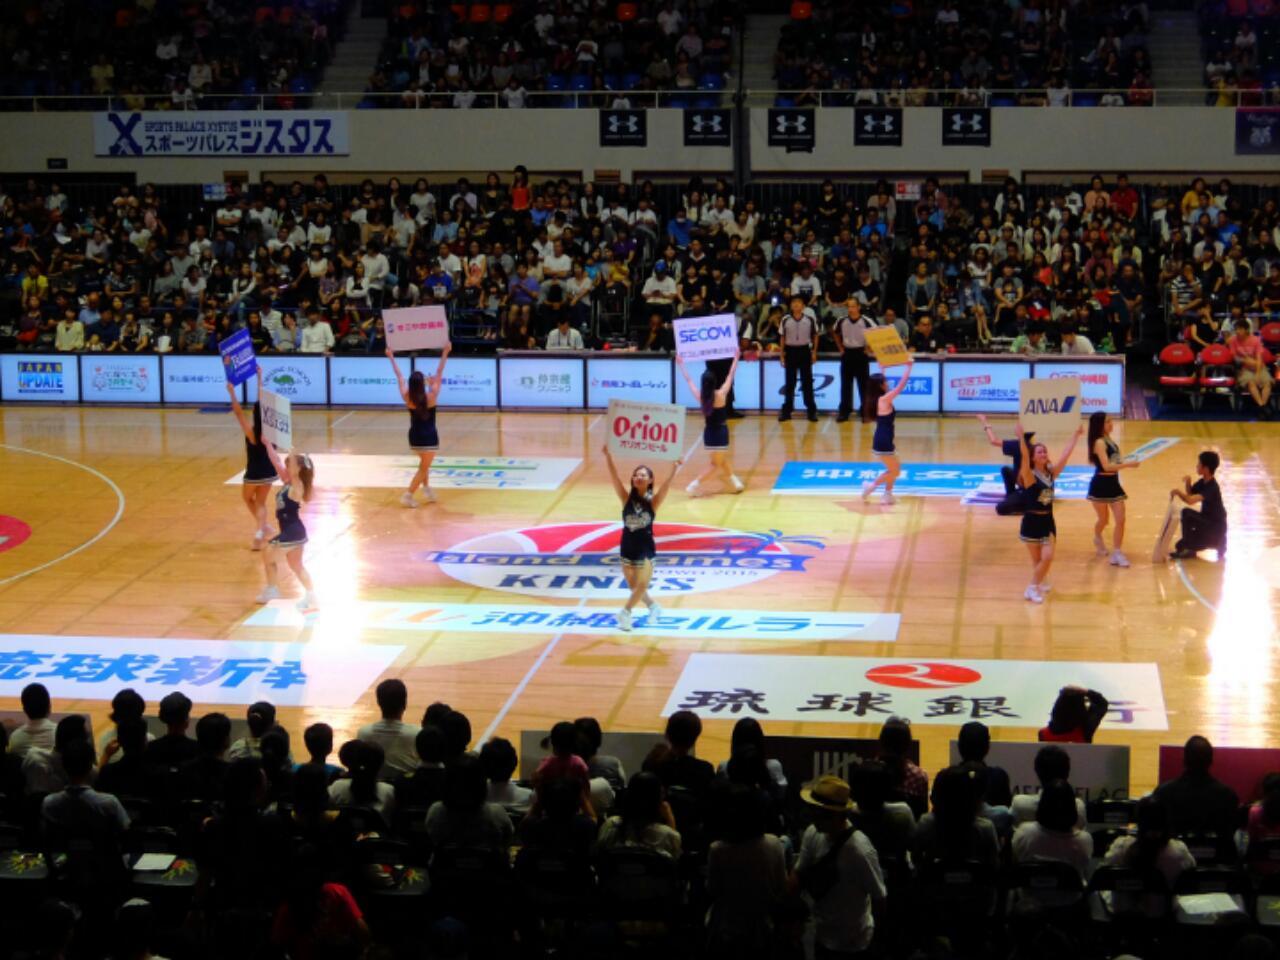 《SW沖縄の旅》Island Games Okinawa 2015_b0344006_23543885.jpg